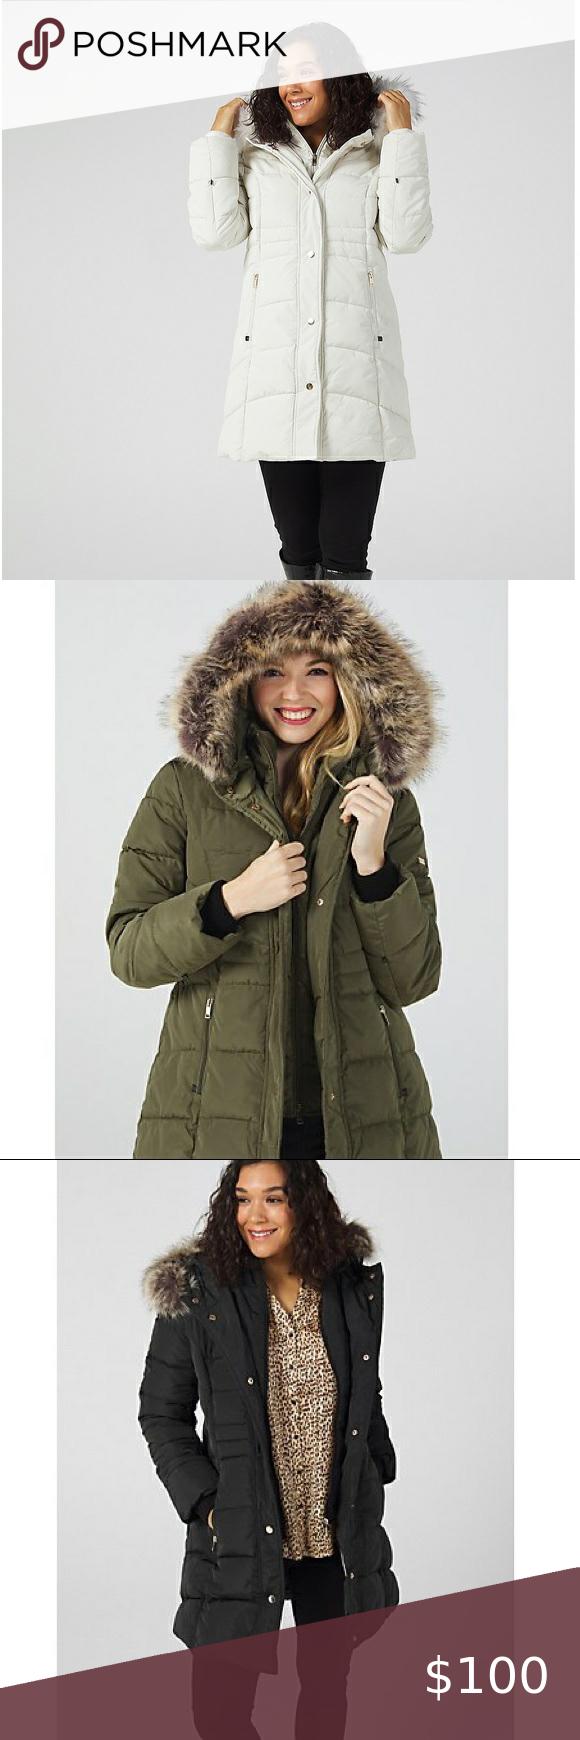 Nwot Centigrade Faux Down Coat In 2021 Coats Jackets Women Vintage Ski Jacket Down Coat [ 1740 x 580 Pixel ]